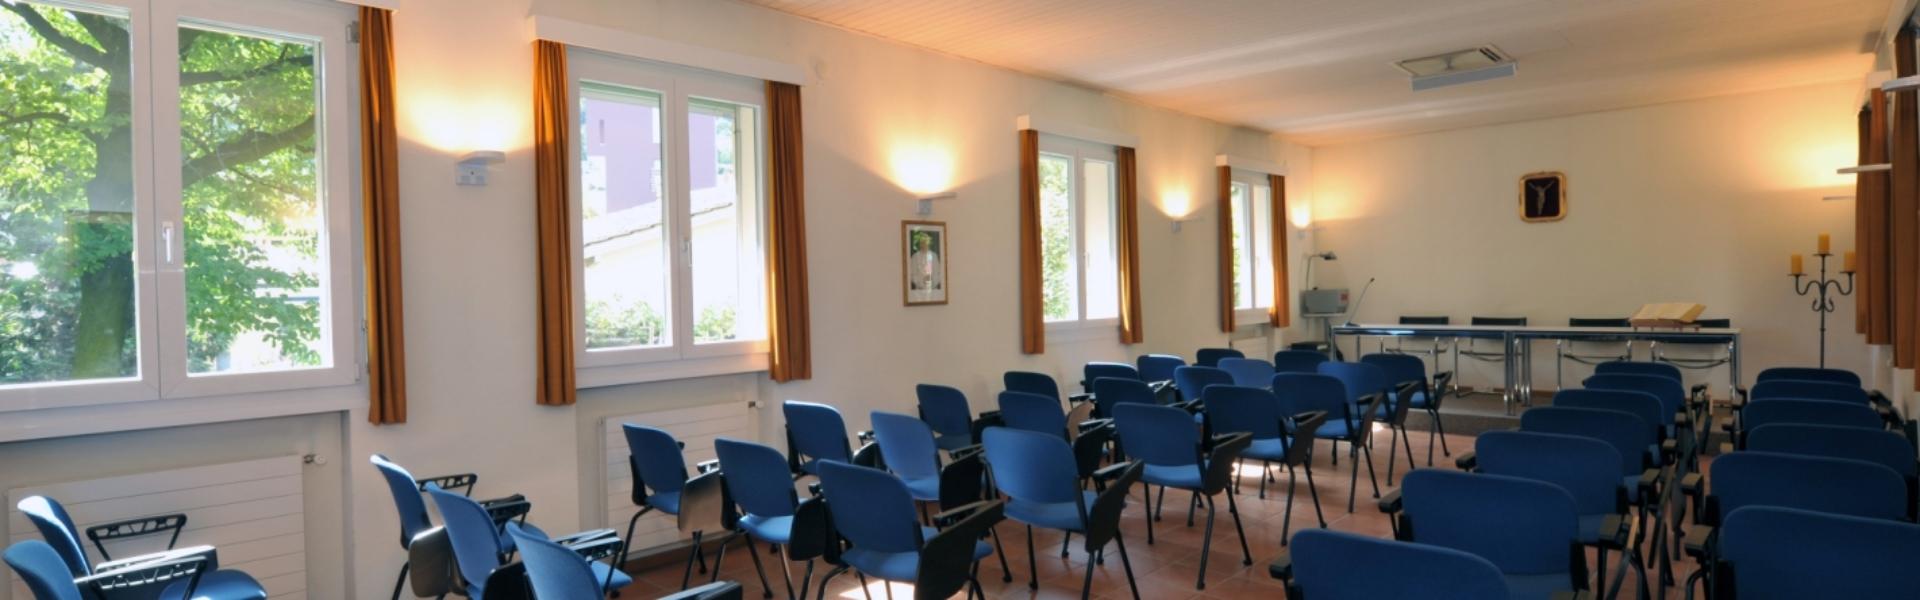 header_casasantabirgitta_salaperconferenze